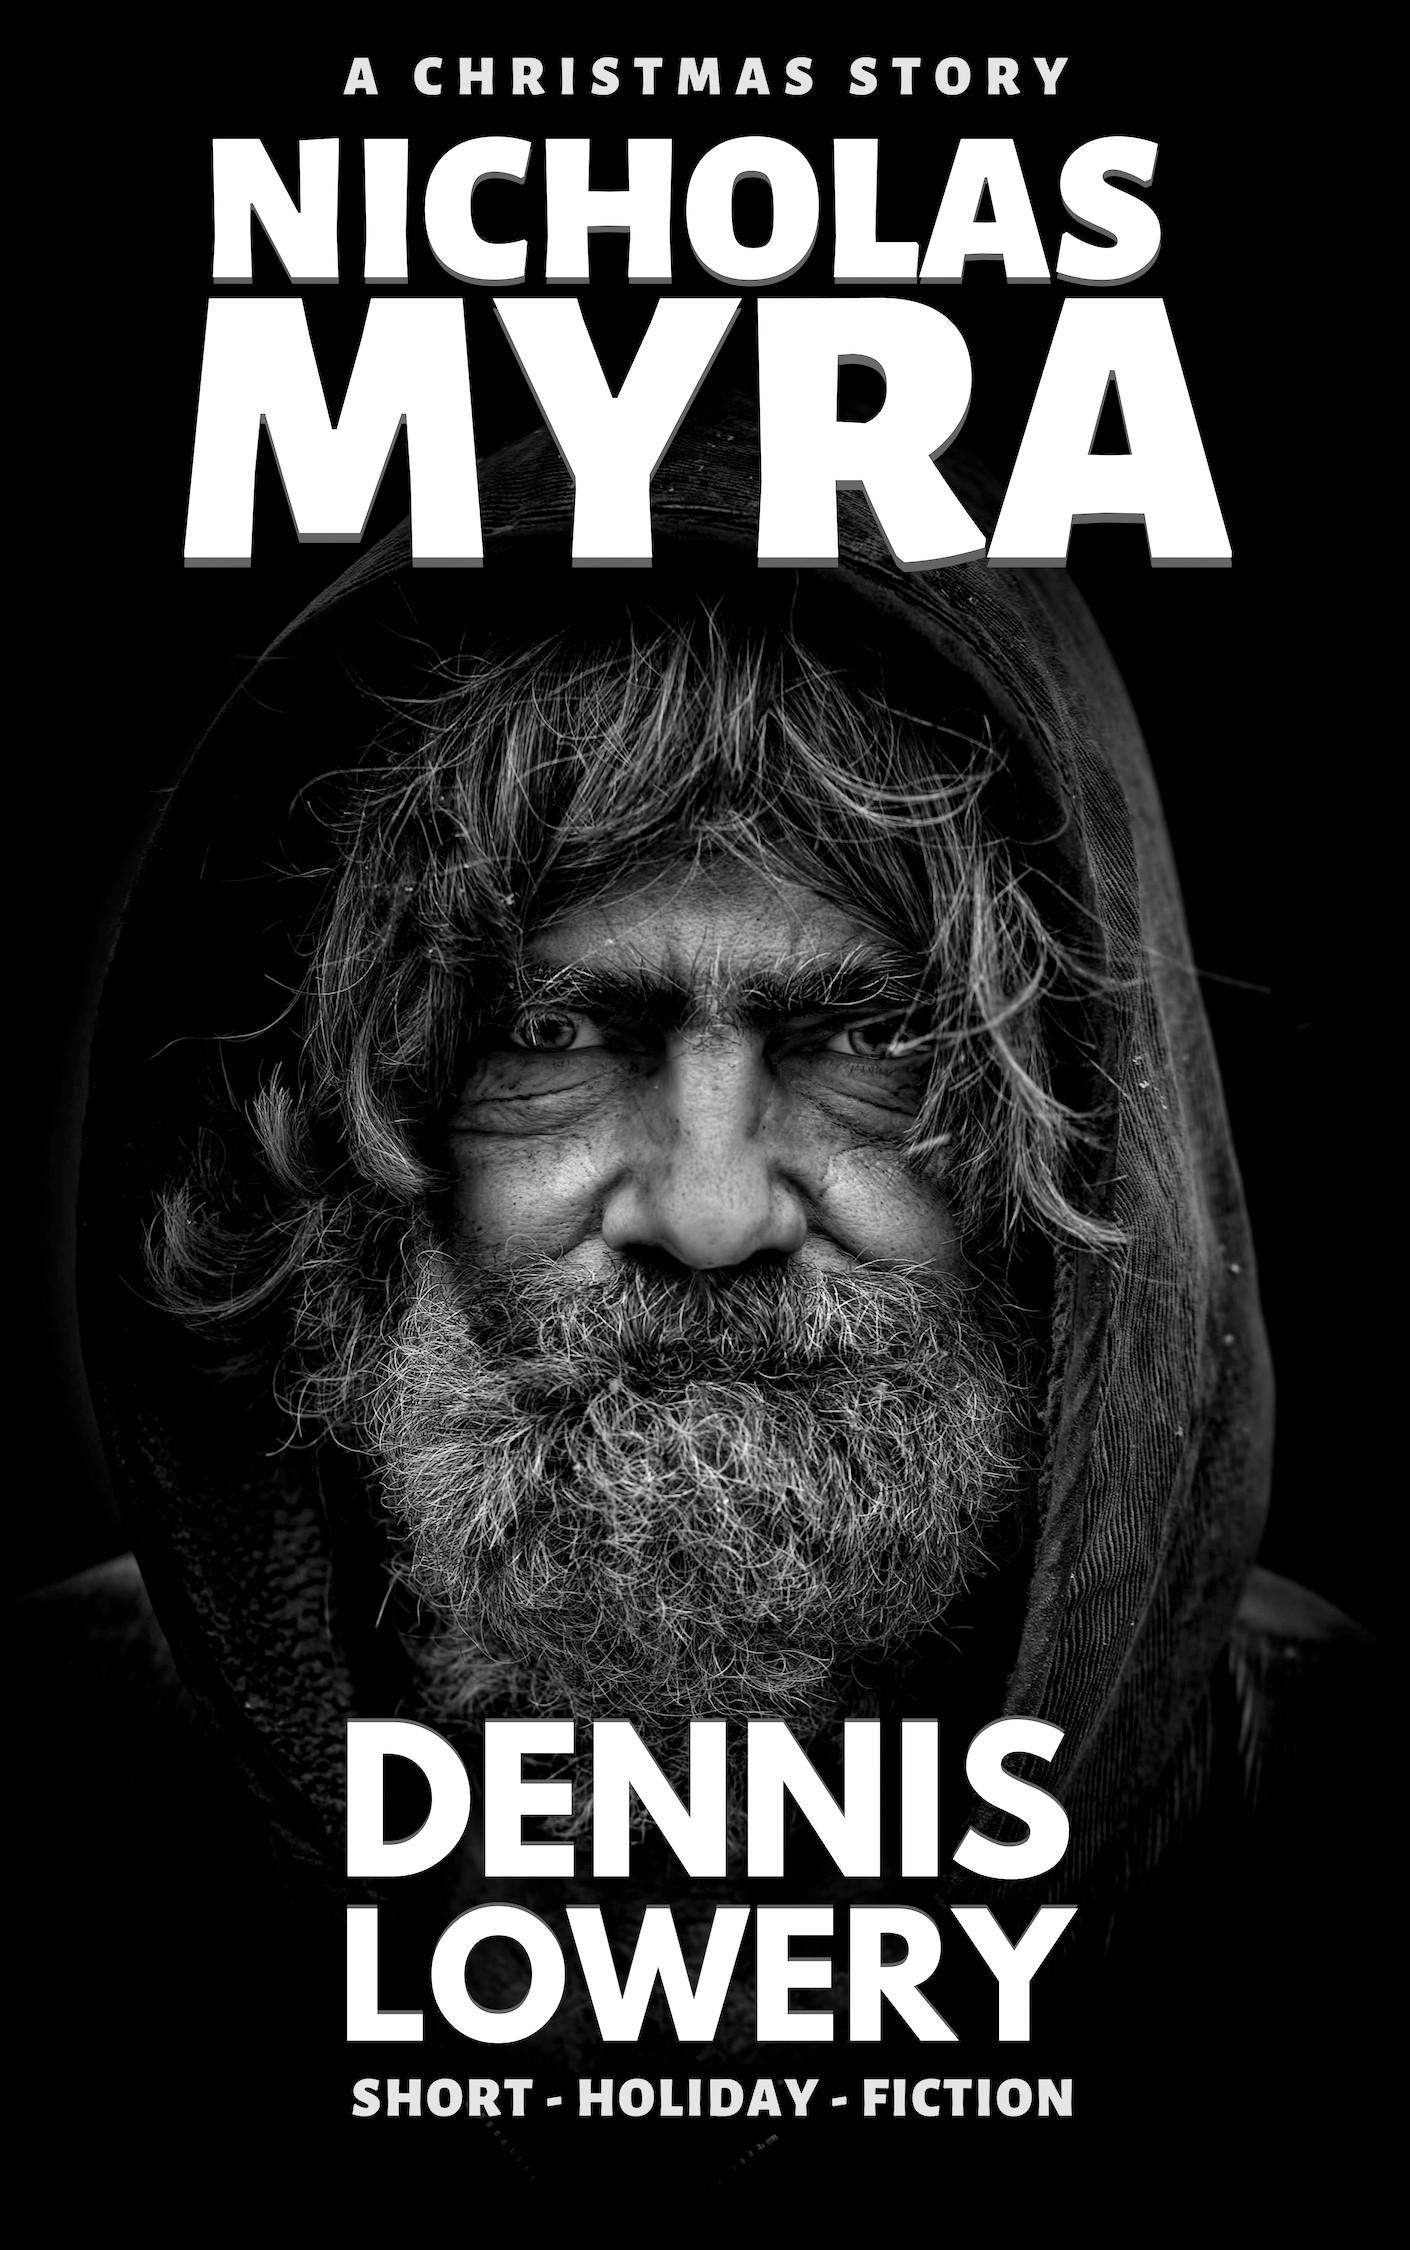 NICHOLAS MYRA - A Christmas Story from Dennis Lowery